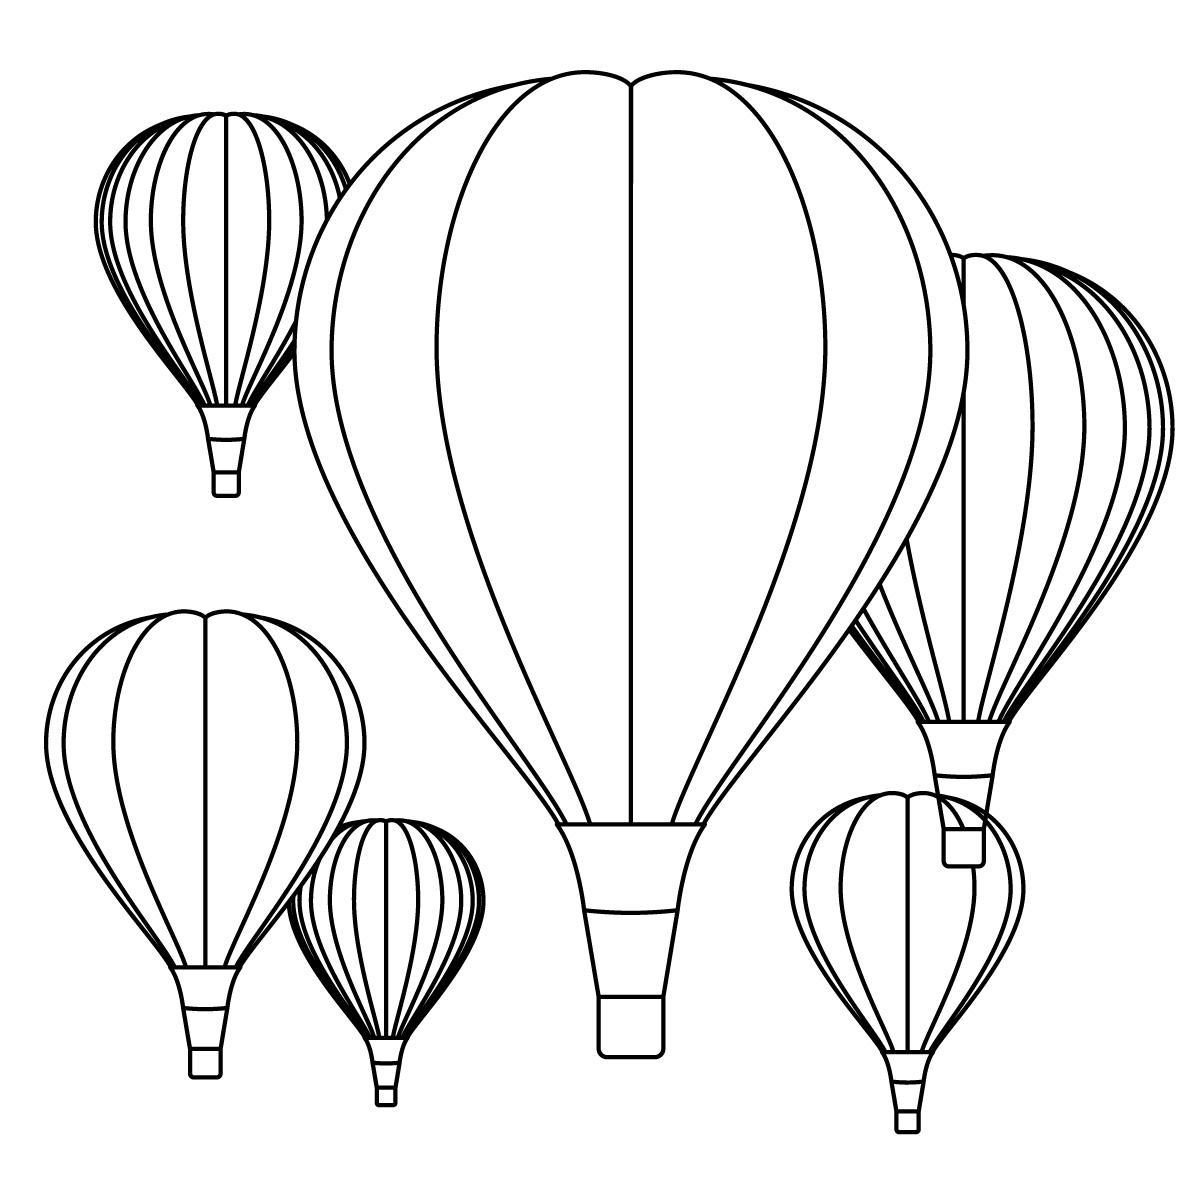 Neon Striped Hot Air Balloon - Free Clip Art | Dibujo de globo aerostatico,  Pintura de globo, Dibujos de globos